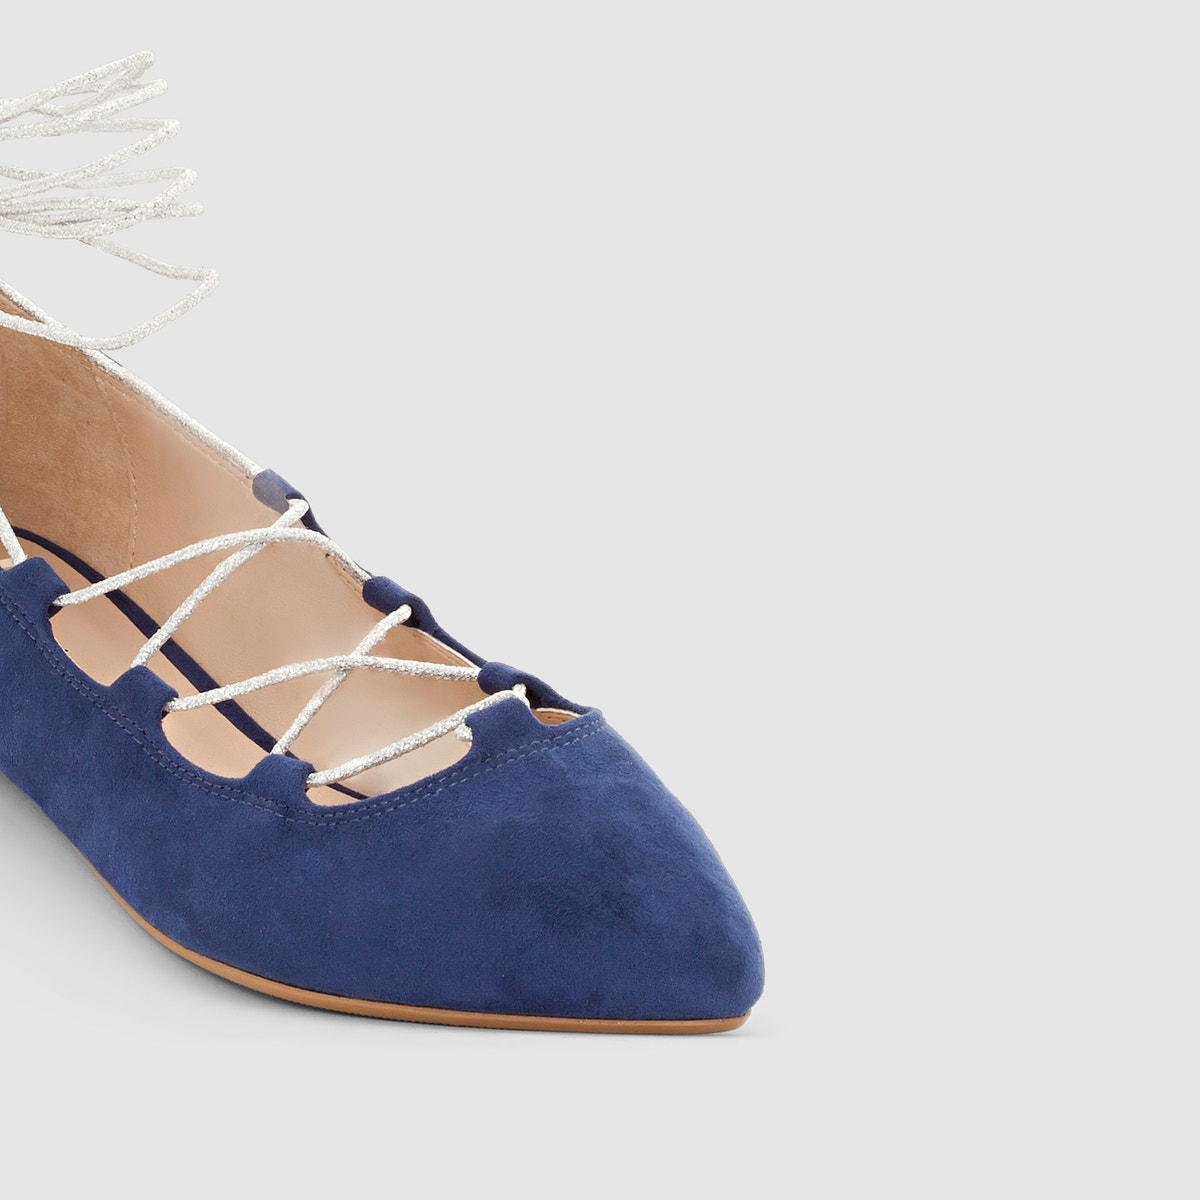 ebabf99520e7 La Redoute Collections Womens Lace-Up Ballet Pumps 350044043